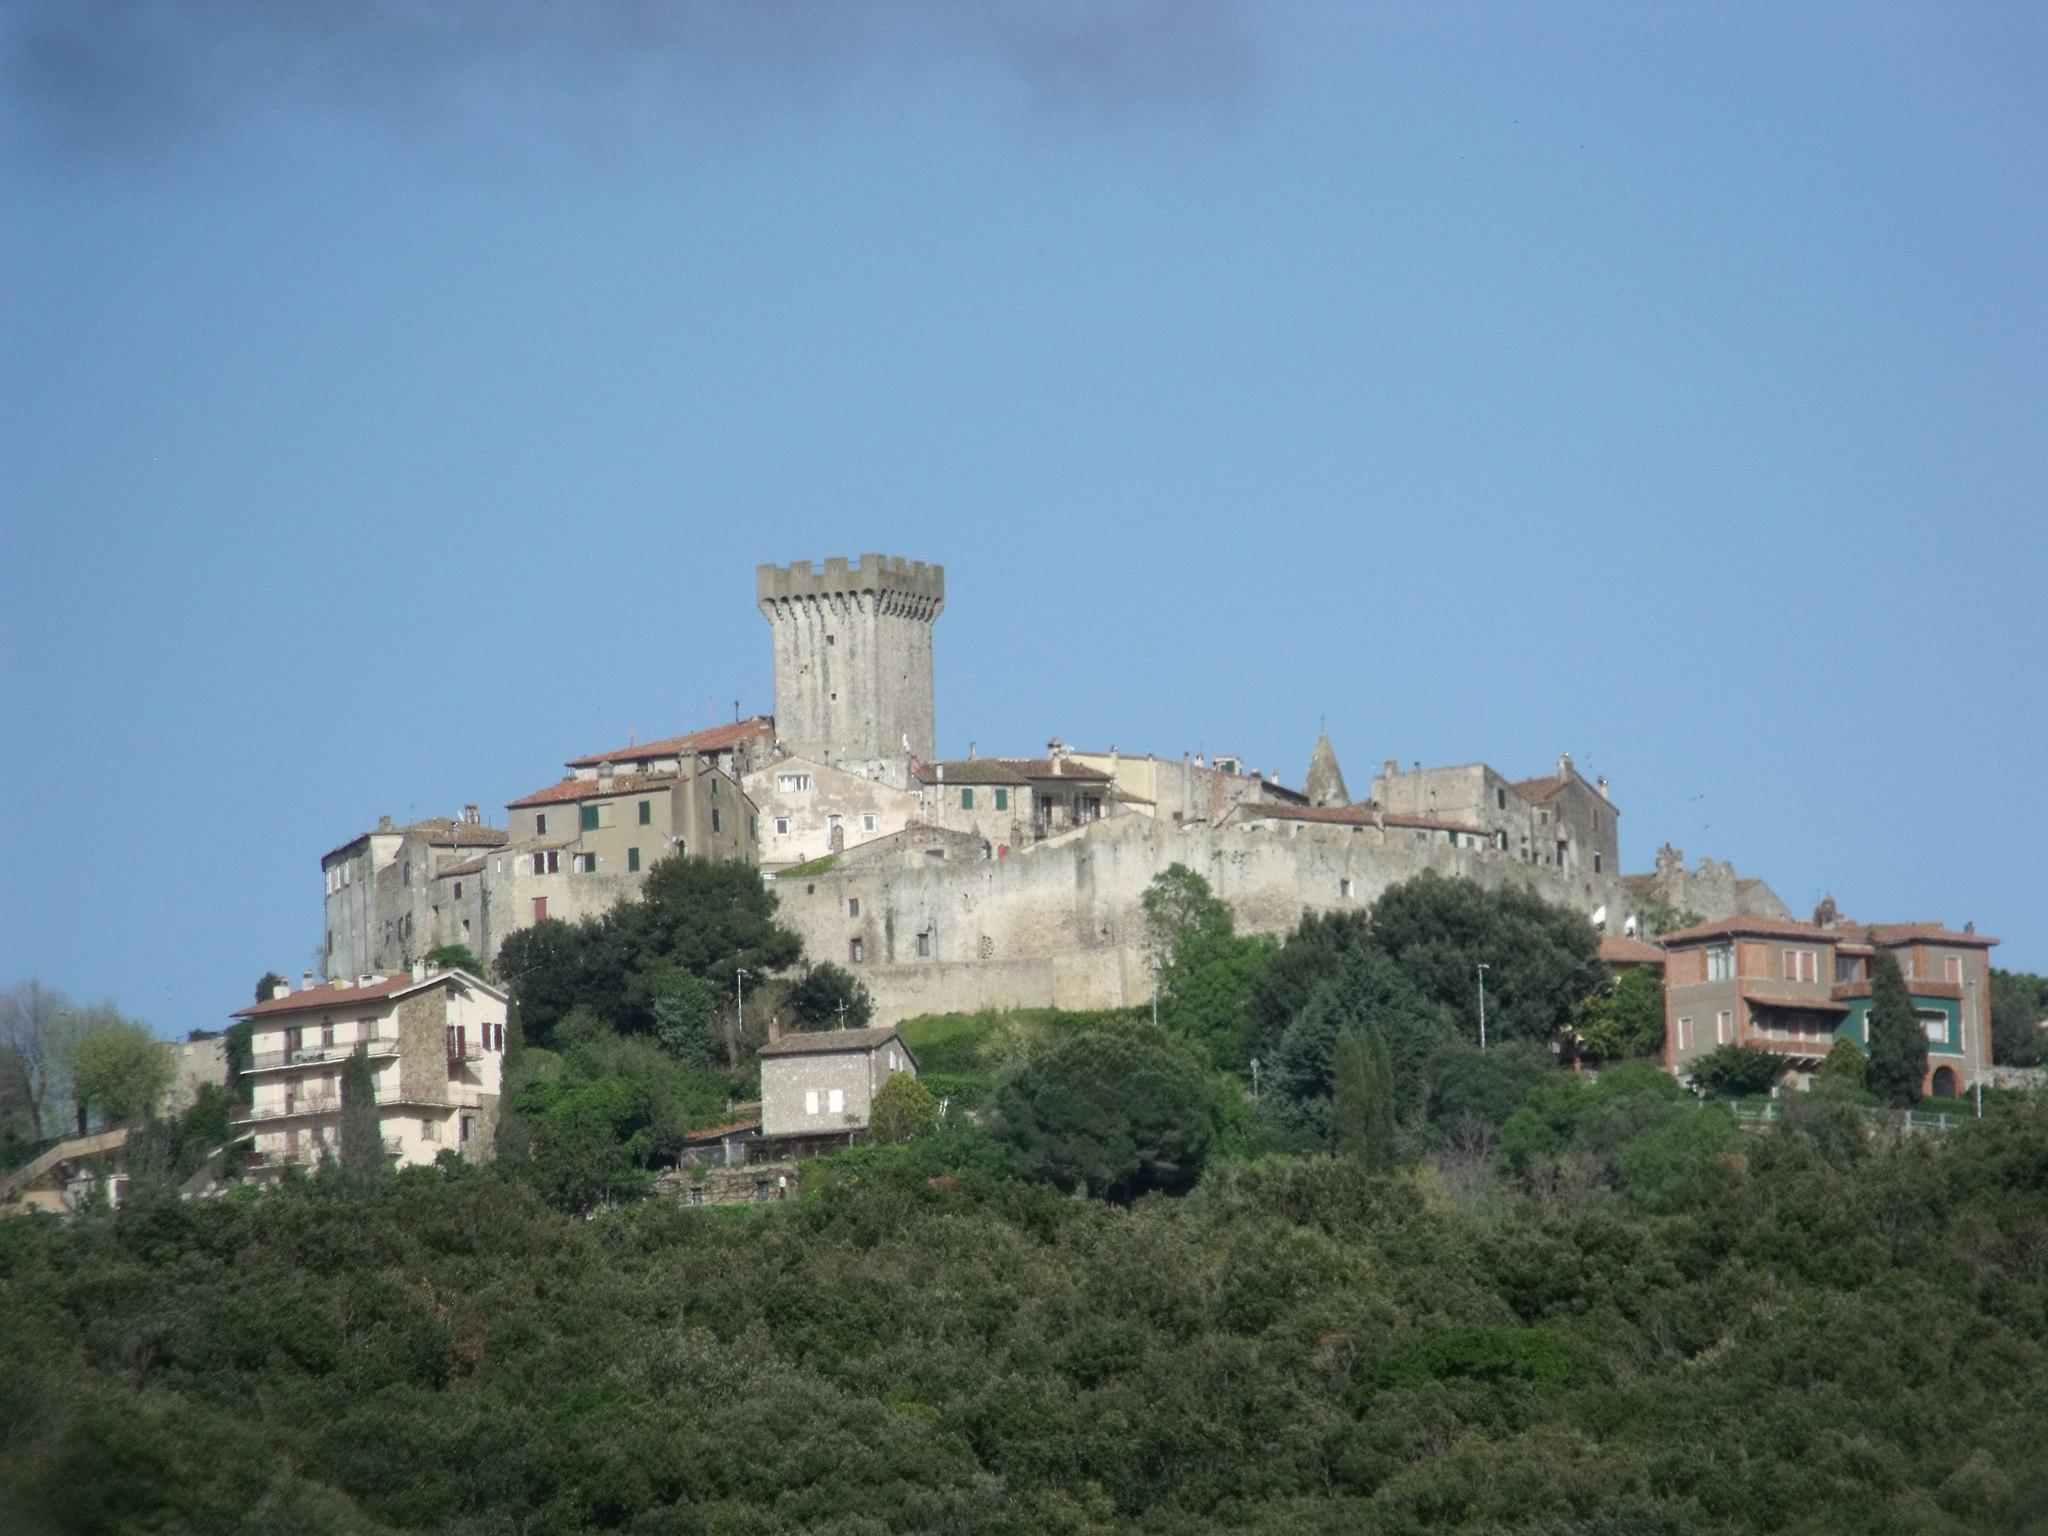 Panorama of Capalbio, Maremma, Province of Grosseto